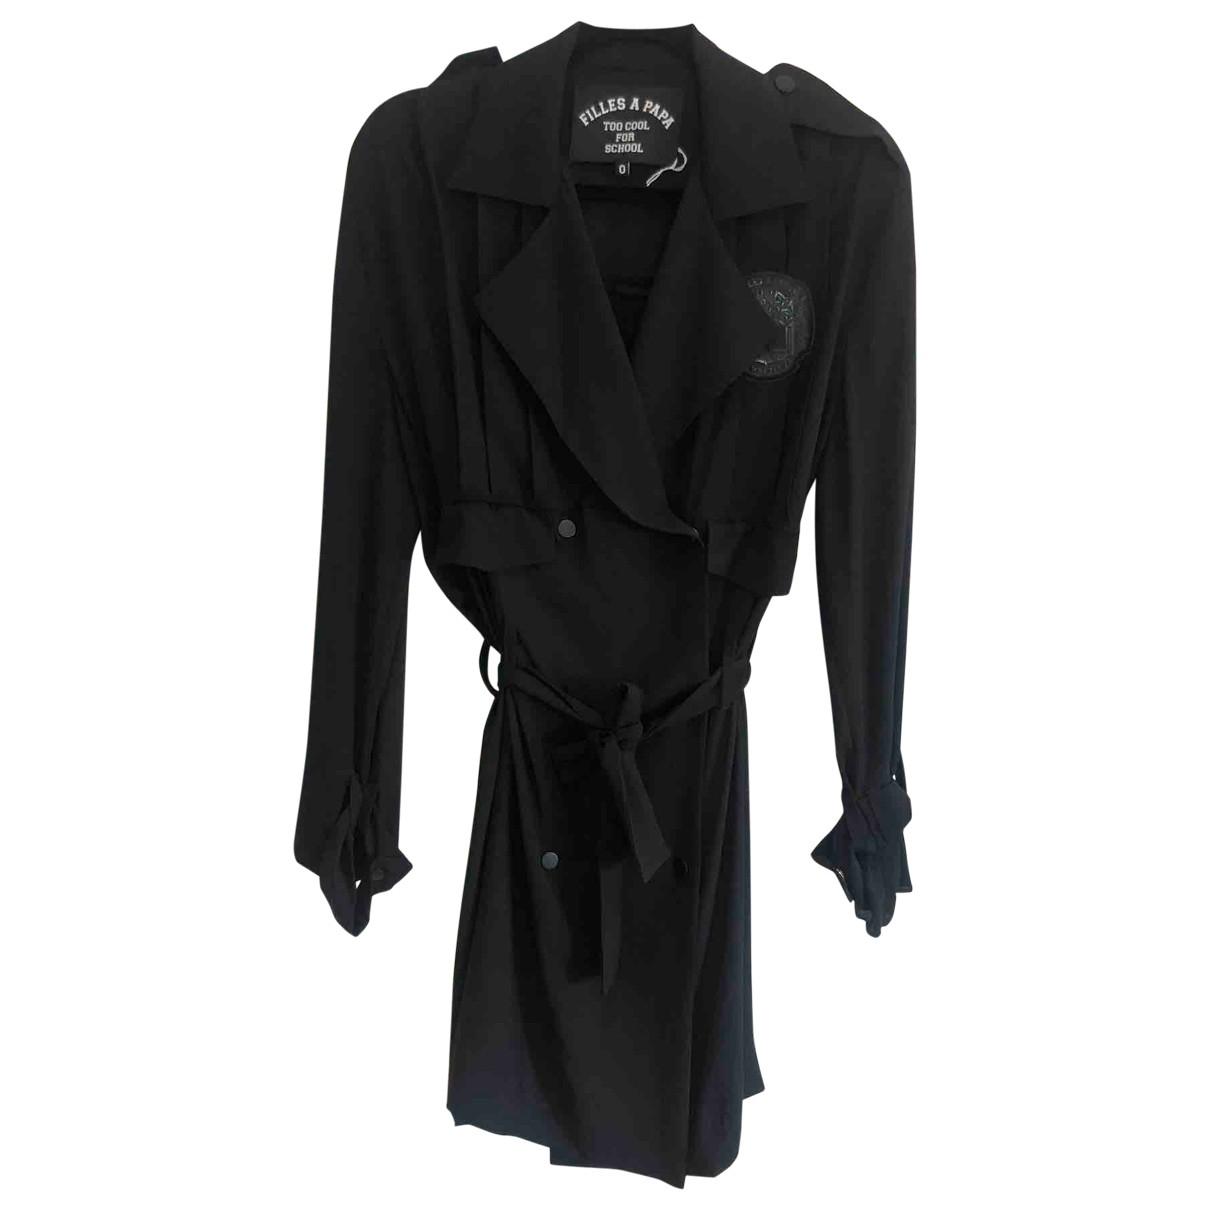 Filles A Papa \N Kleid in  Schwarz Polyester